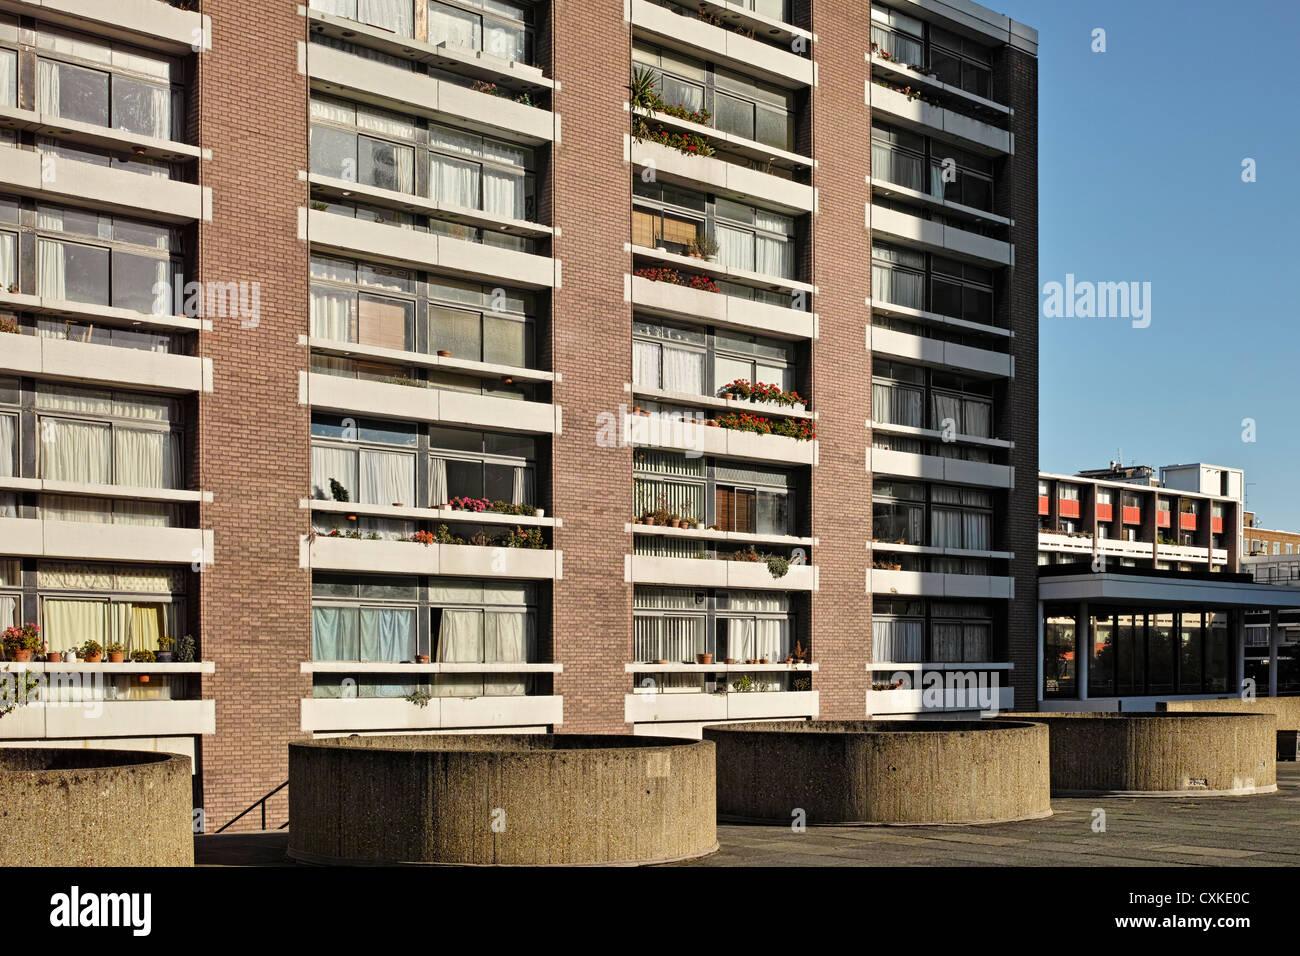 Golden Lane Estate Social Housing - Stock Image